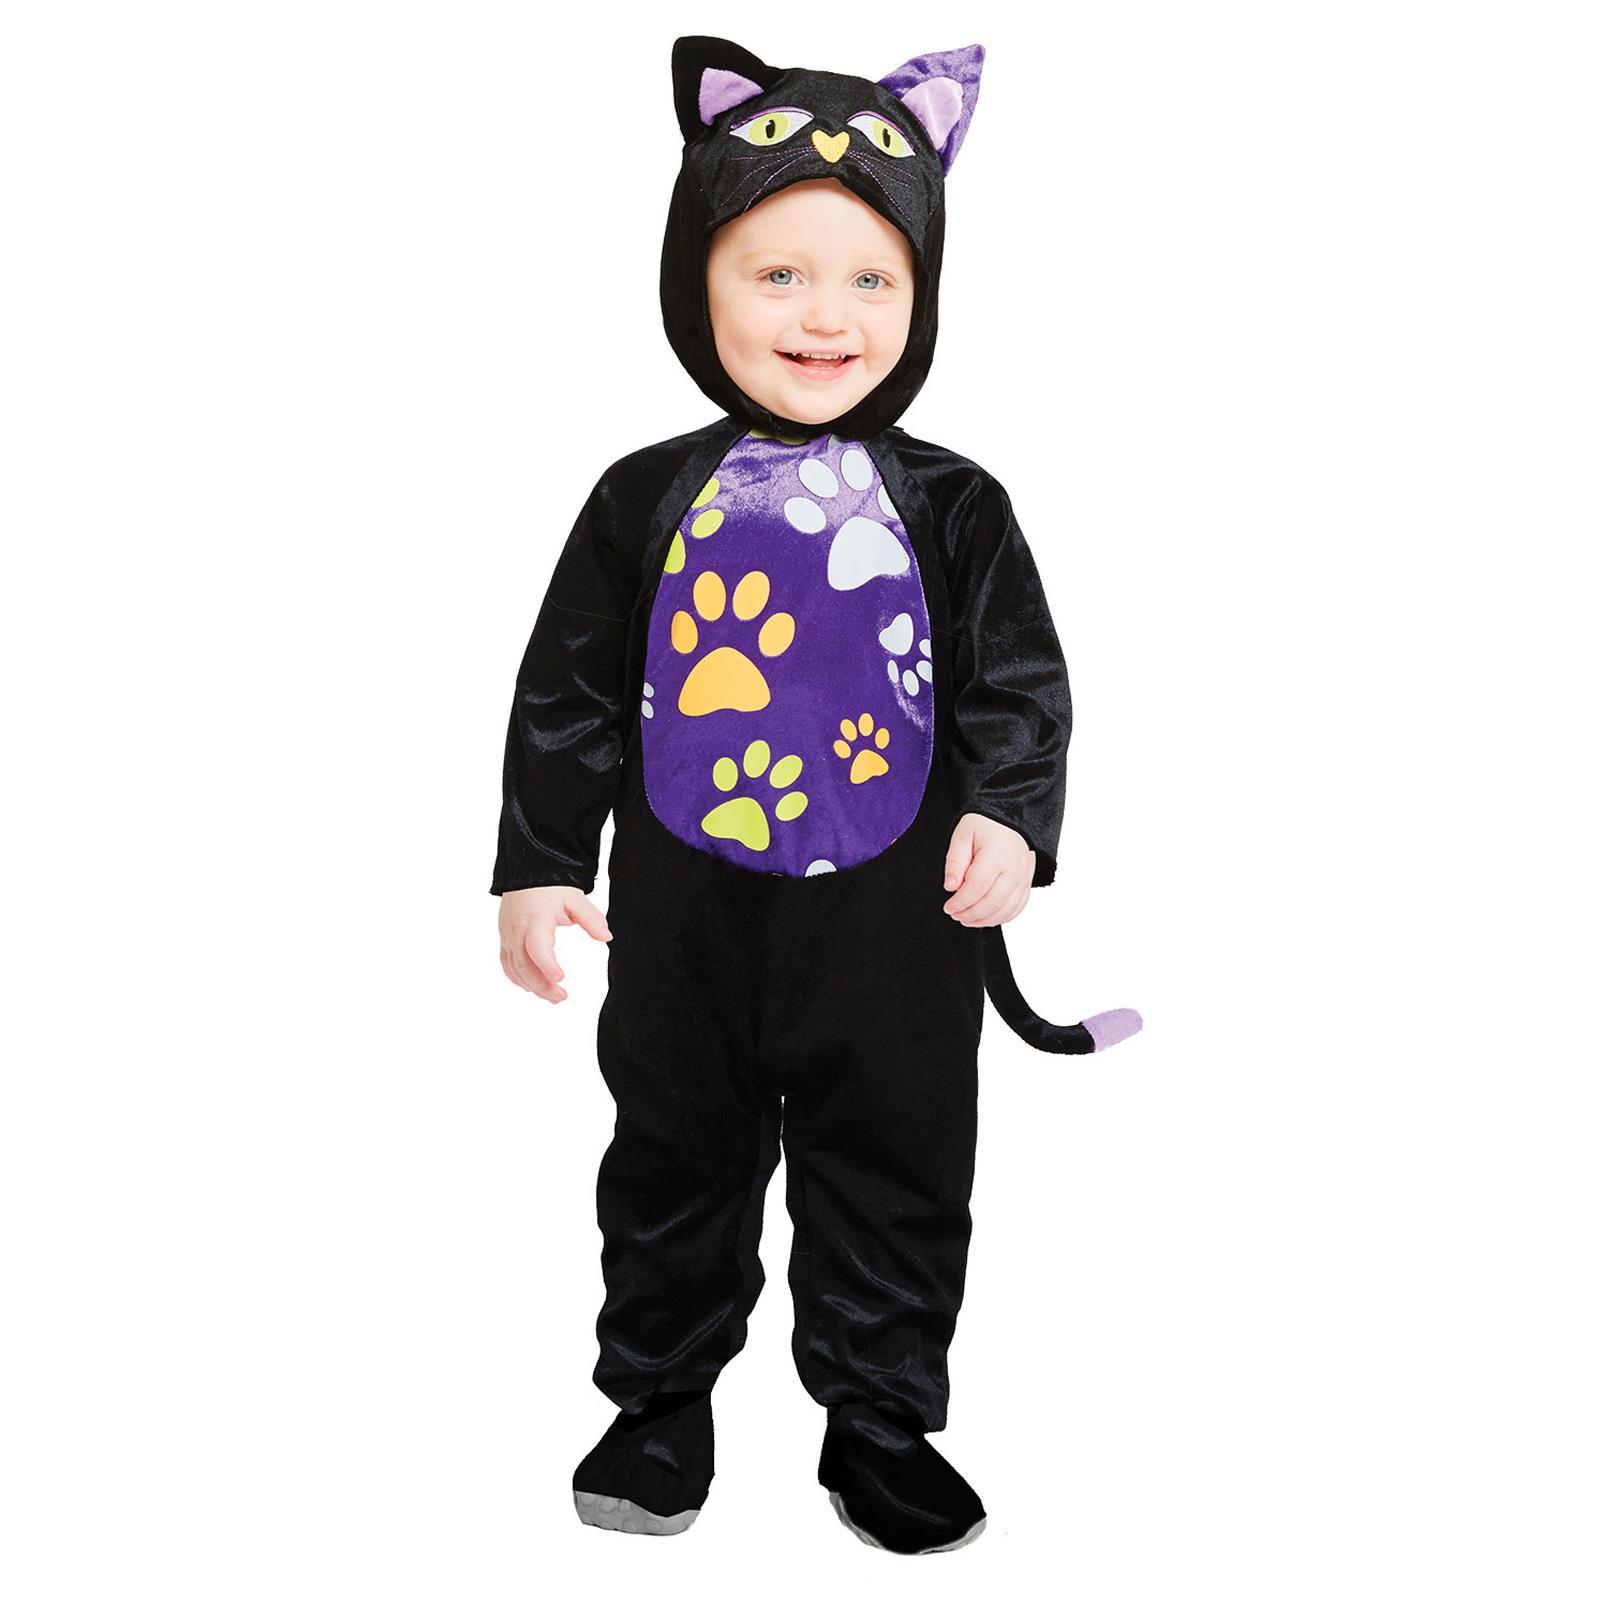 Little Scheletro Outfit Costume Halloween Neonato Carino